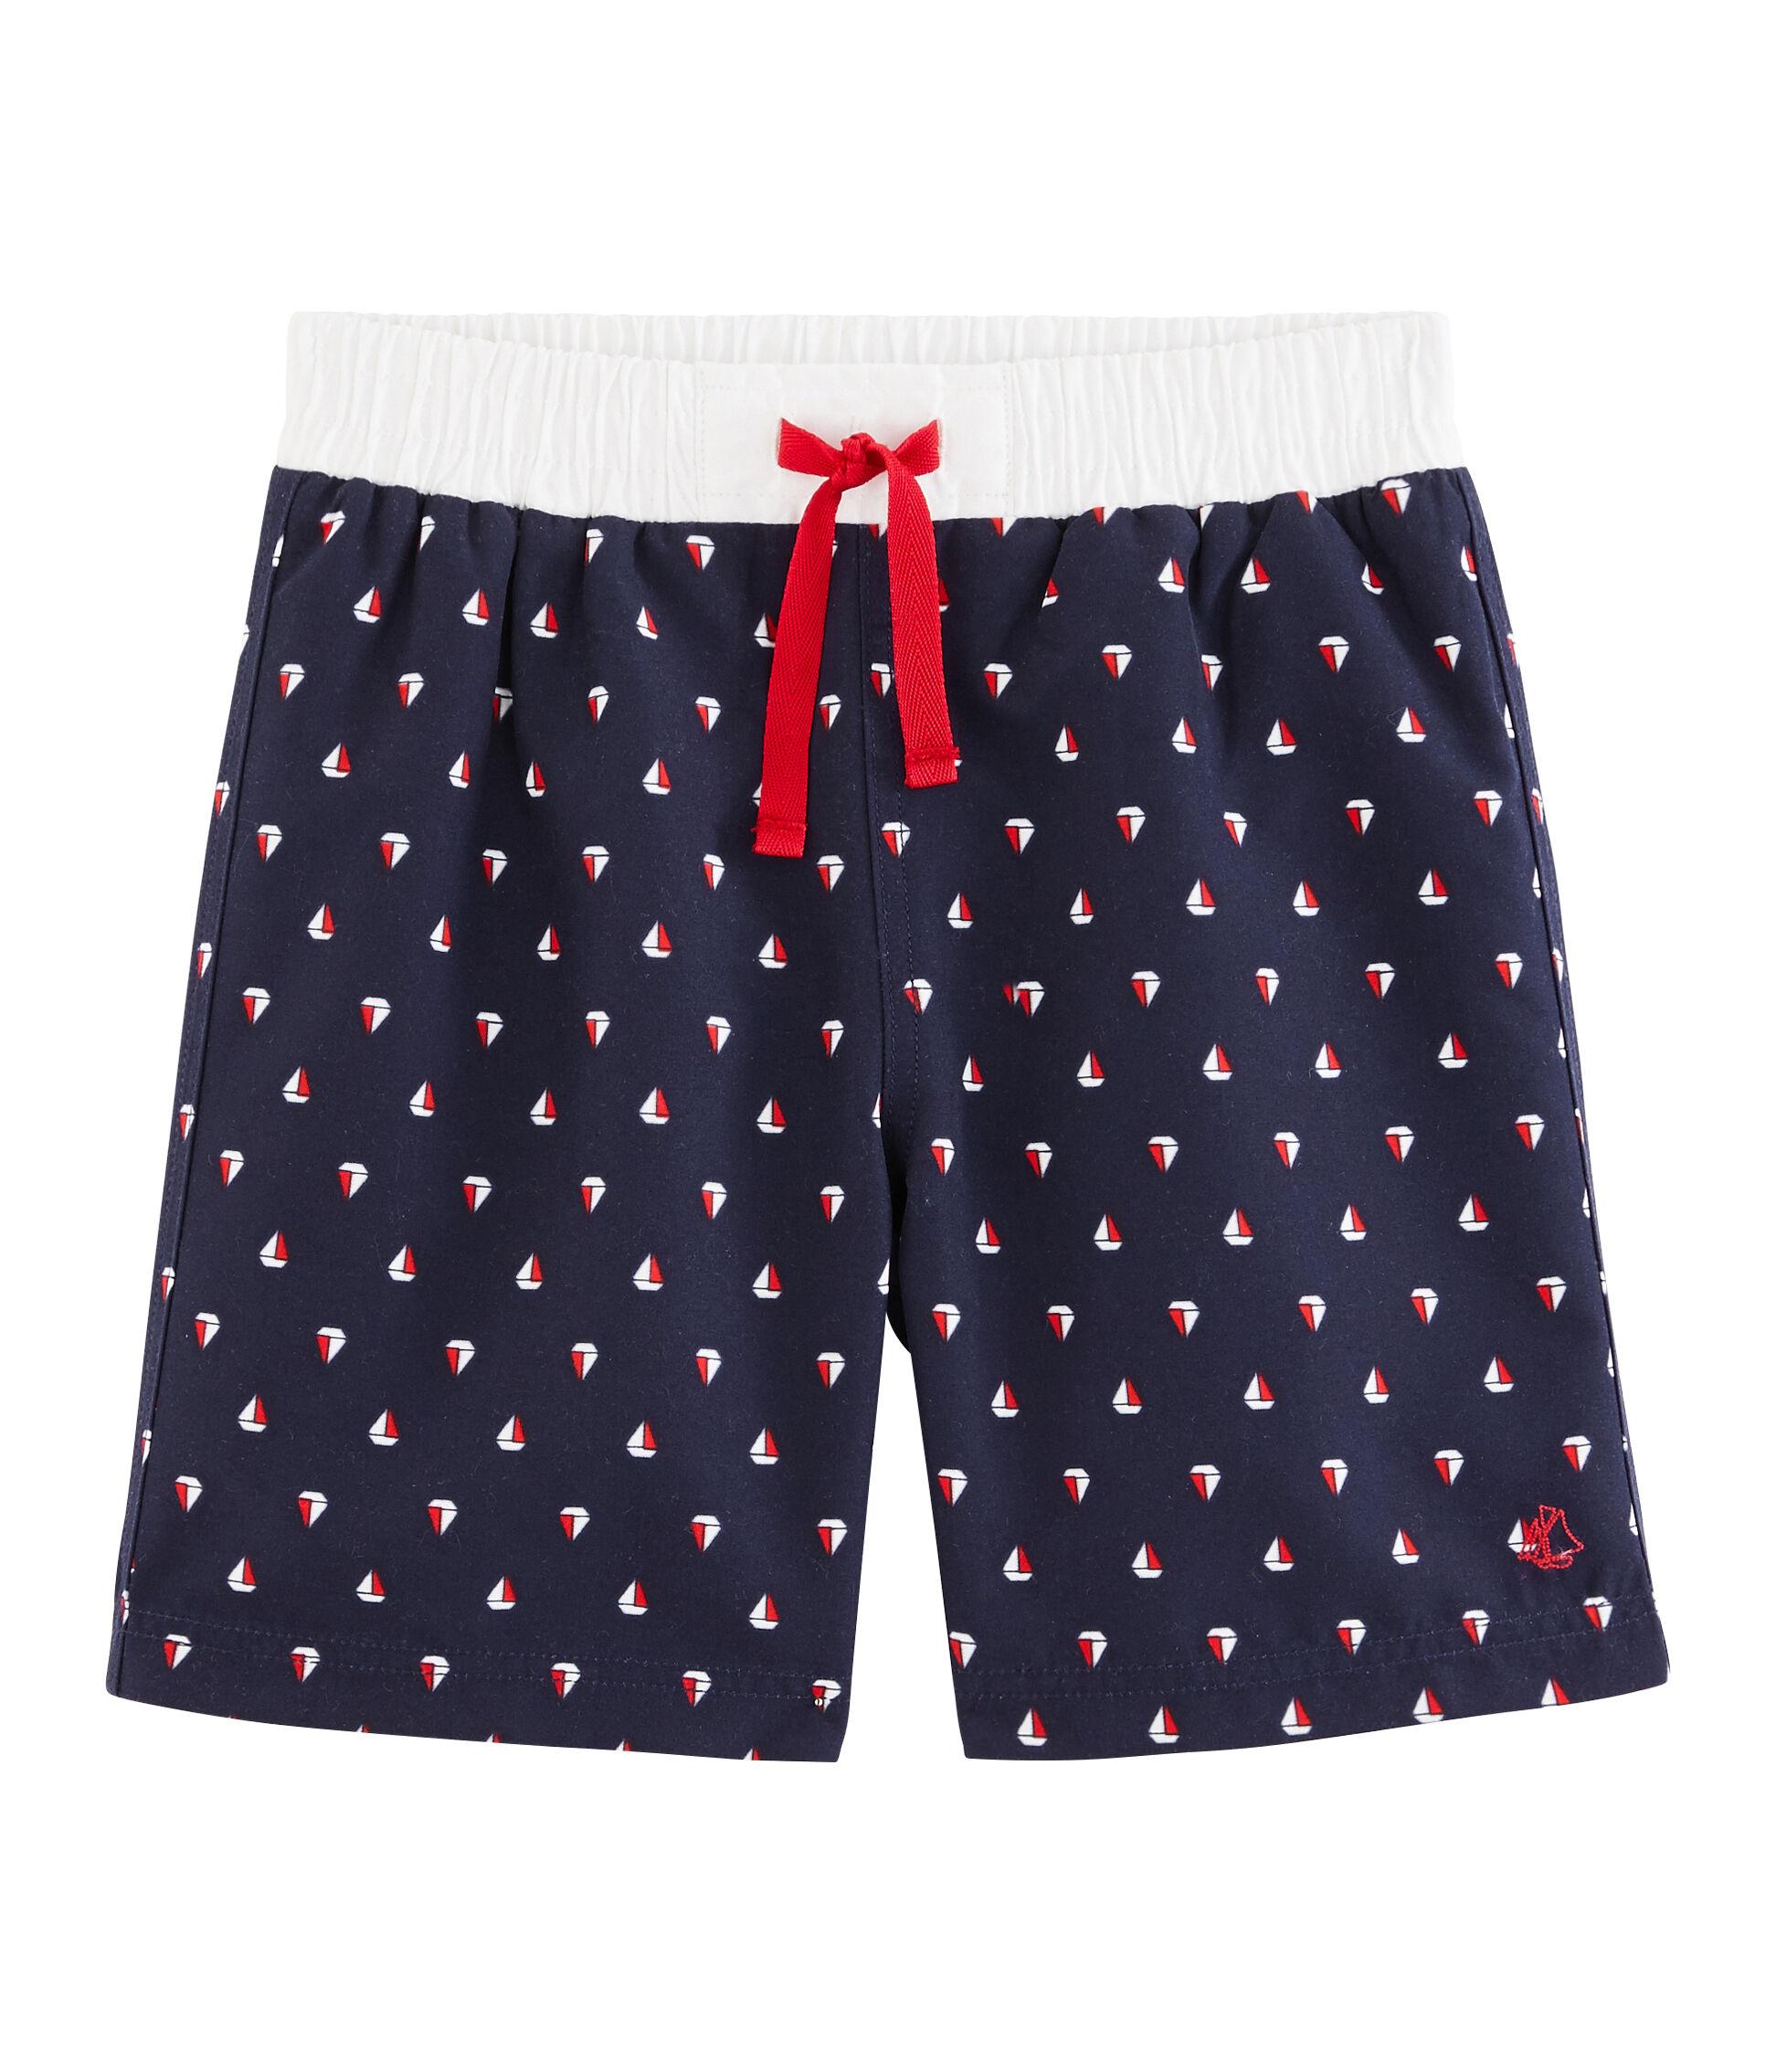 Petit Bateau Pantaloncini da Bagno Bambino